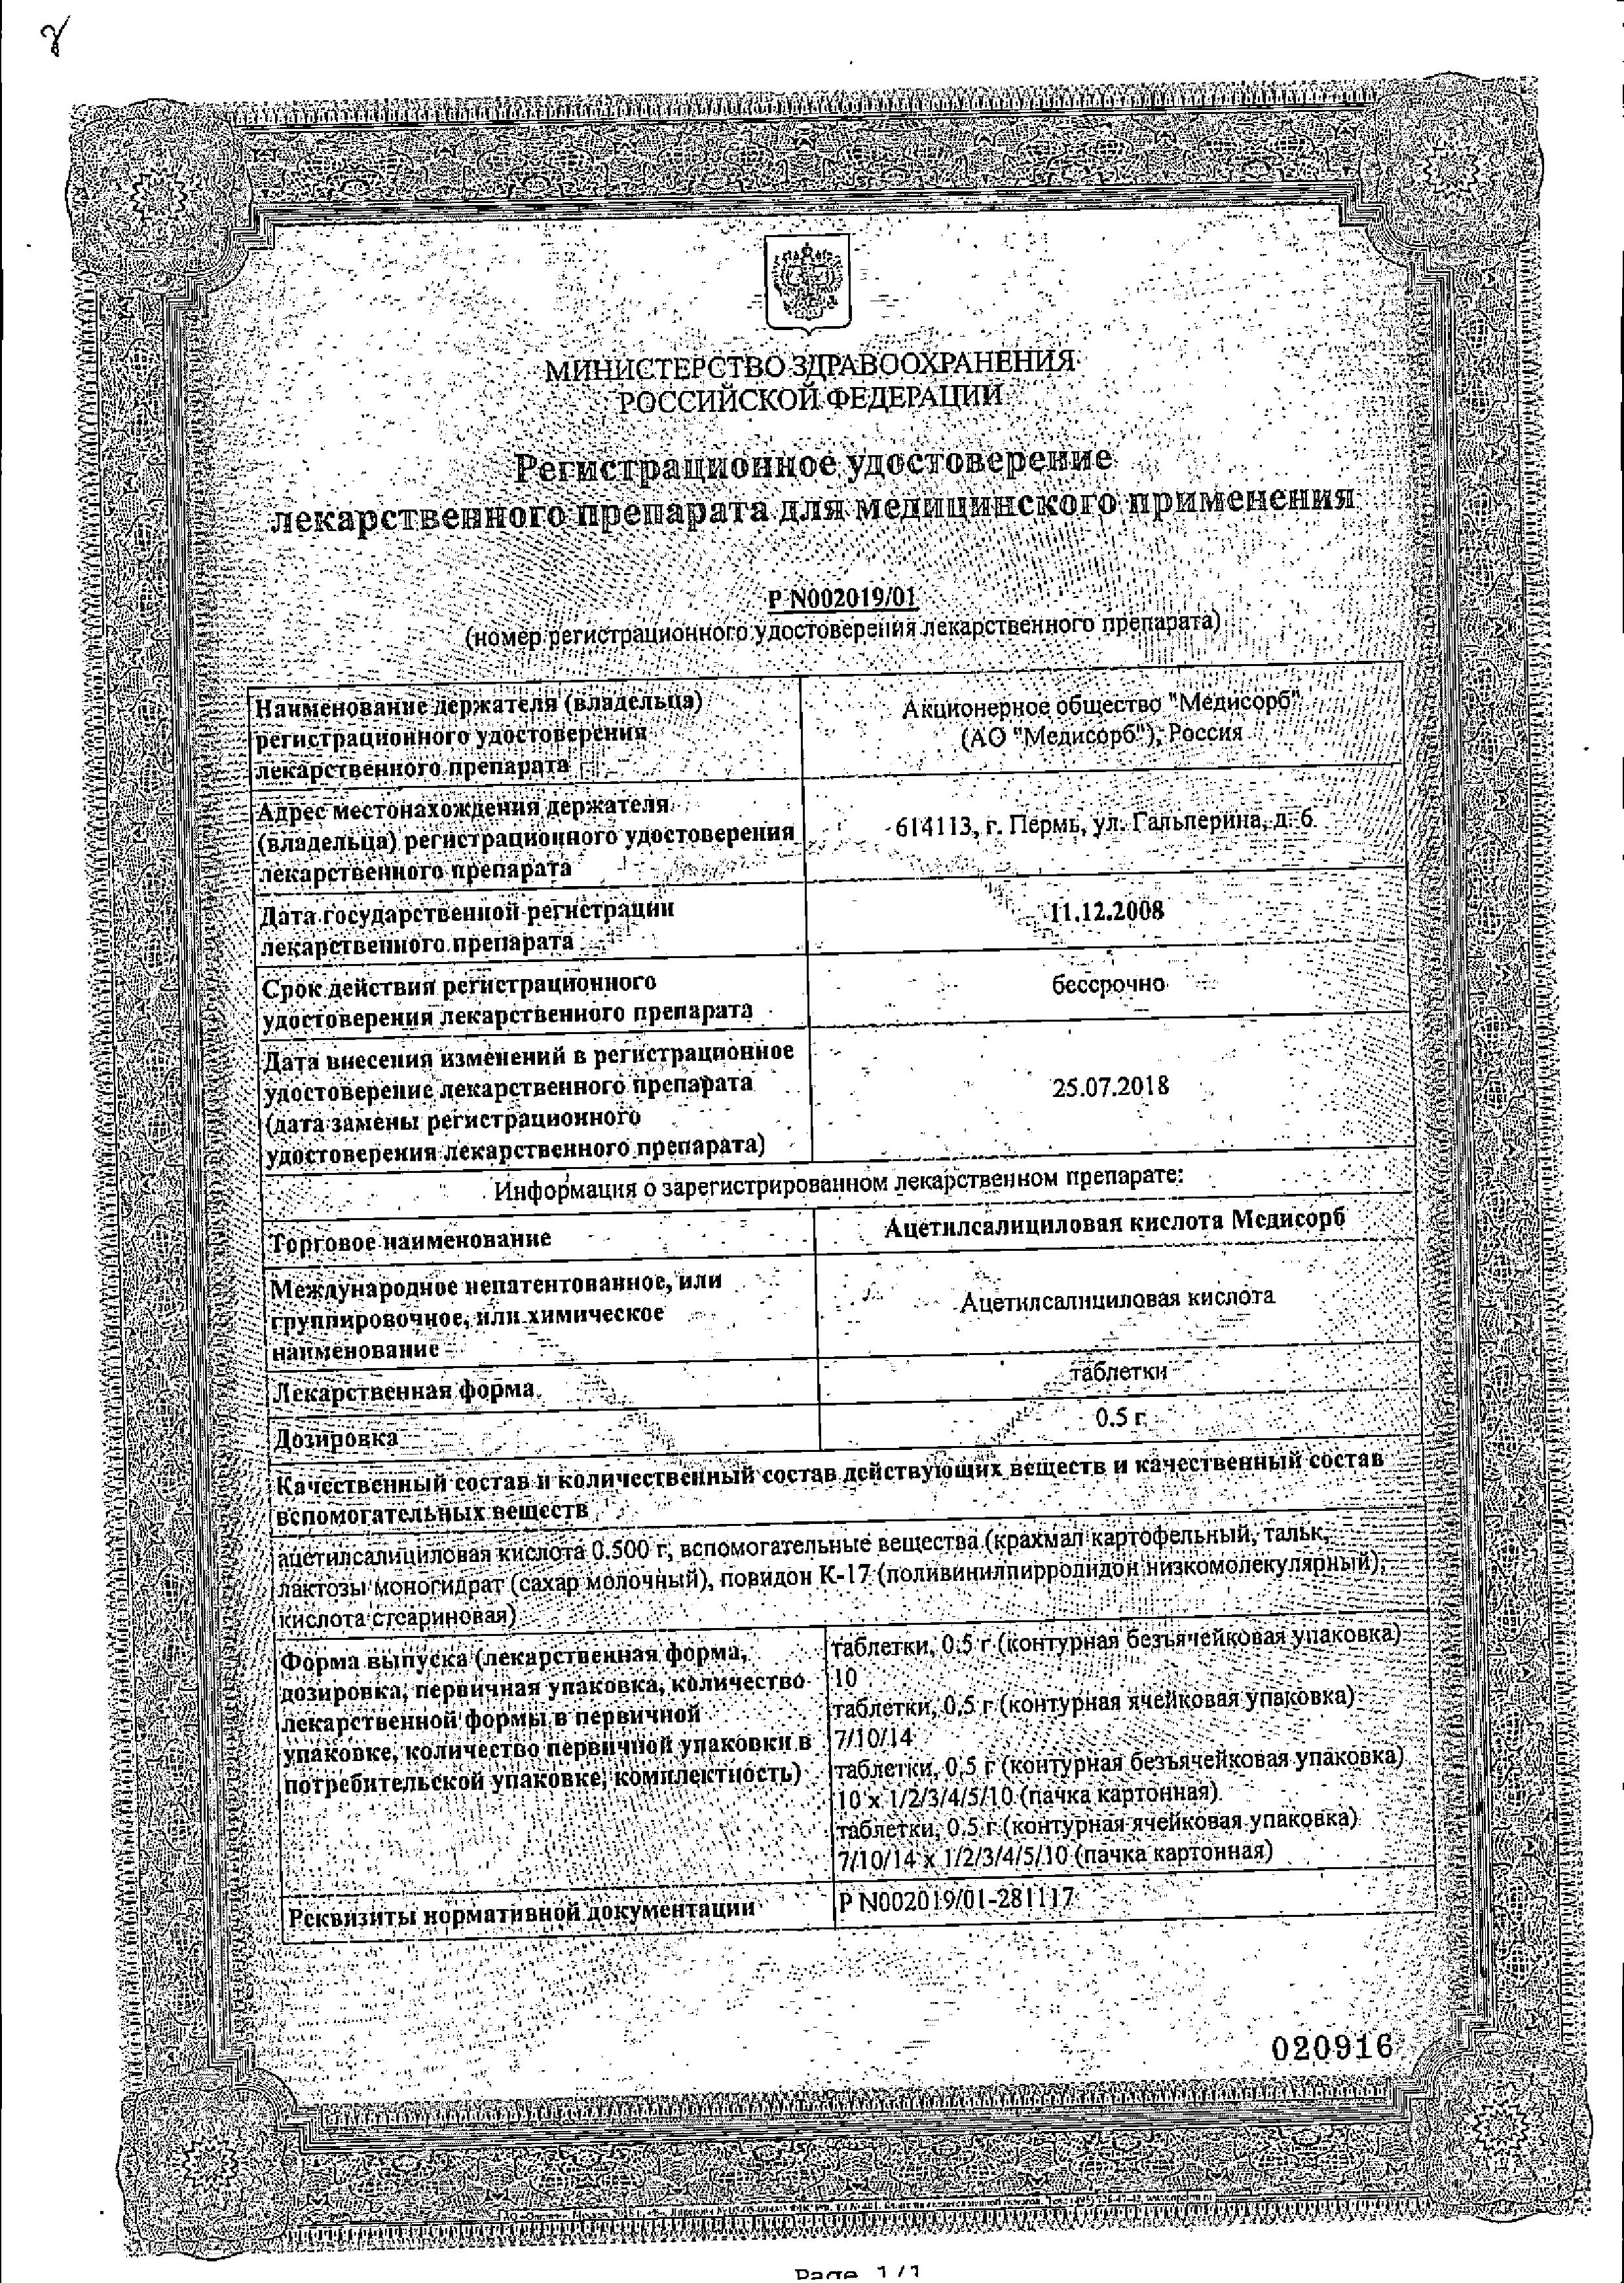 Ацетилсалициловая кислота МС сертификат